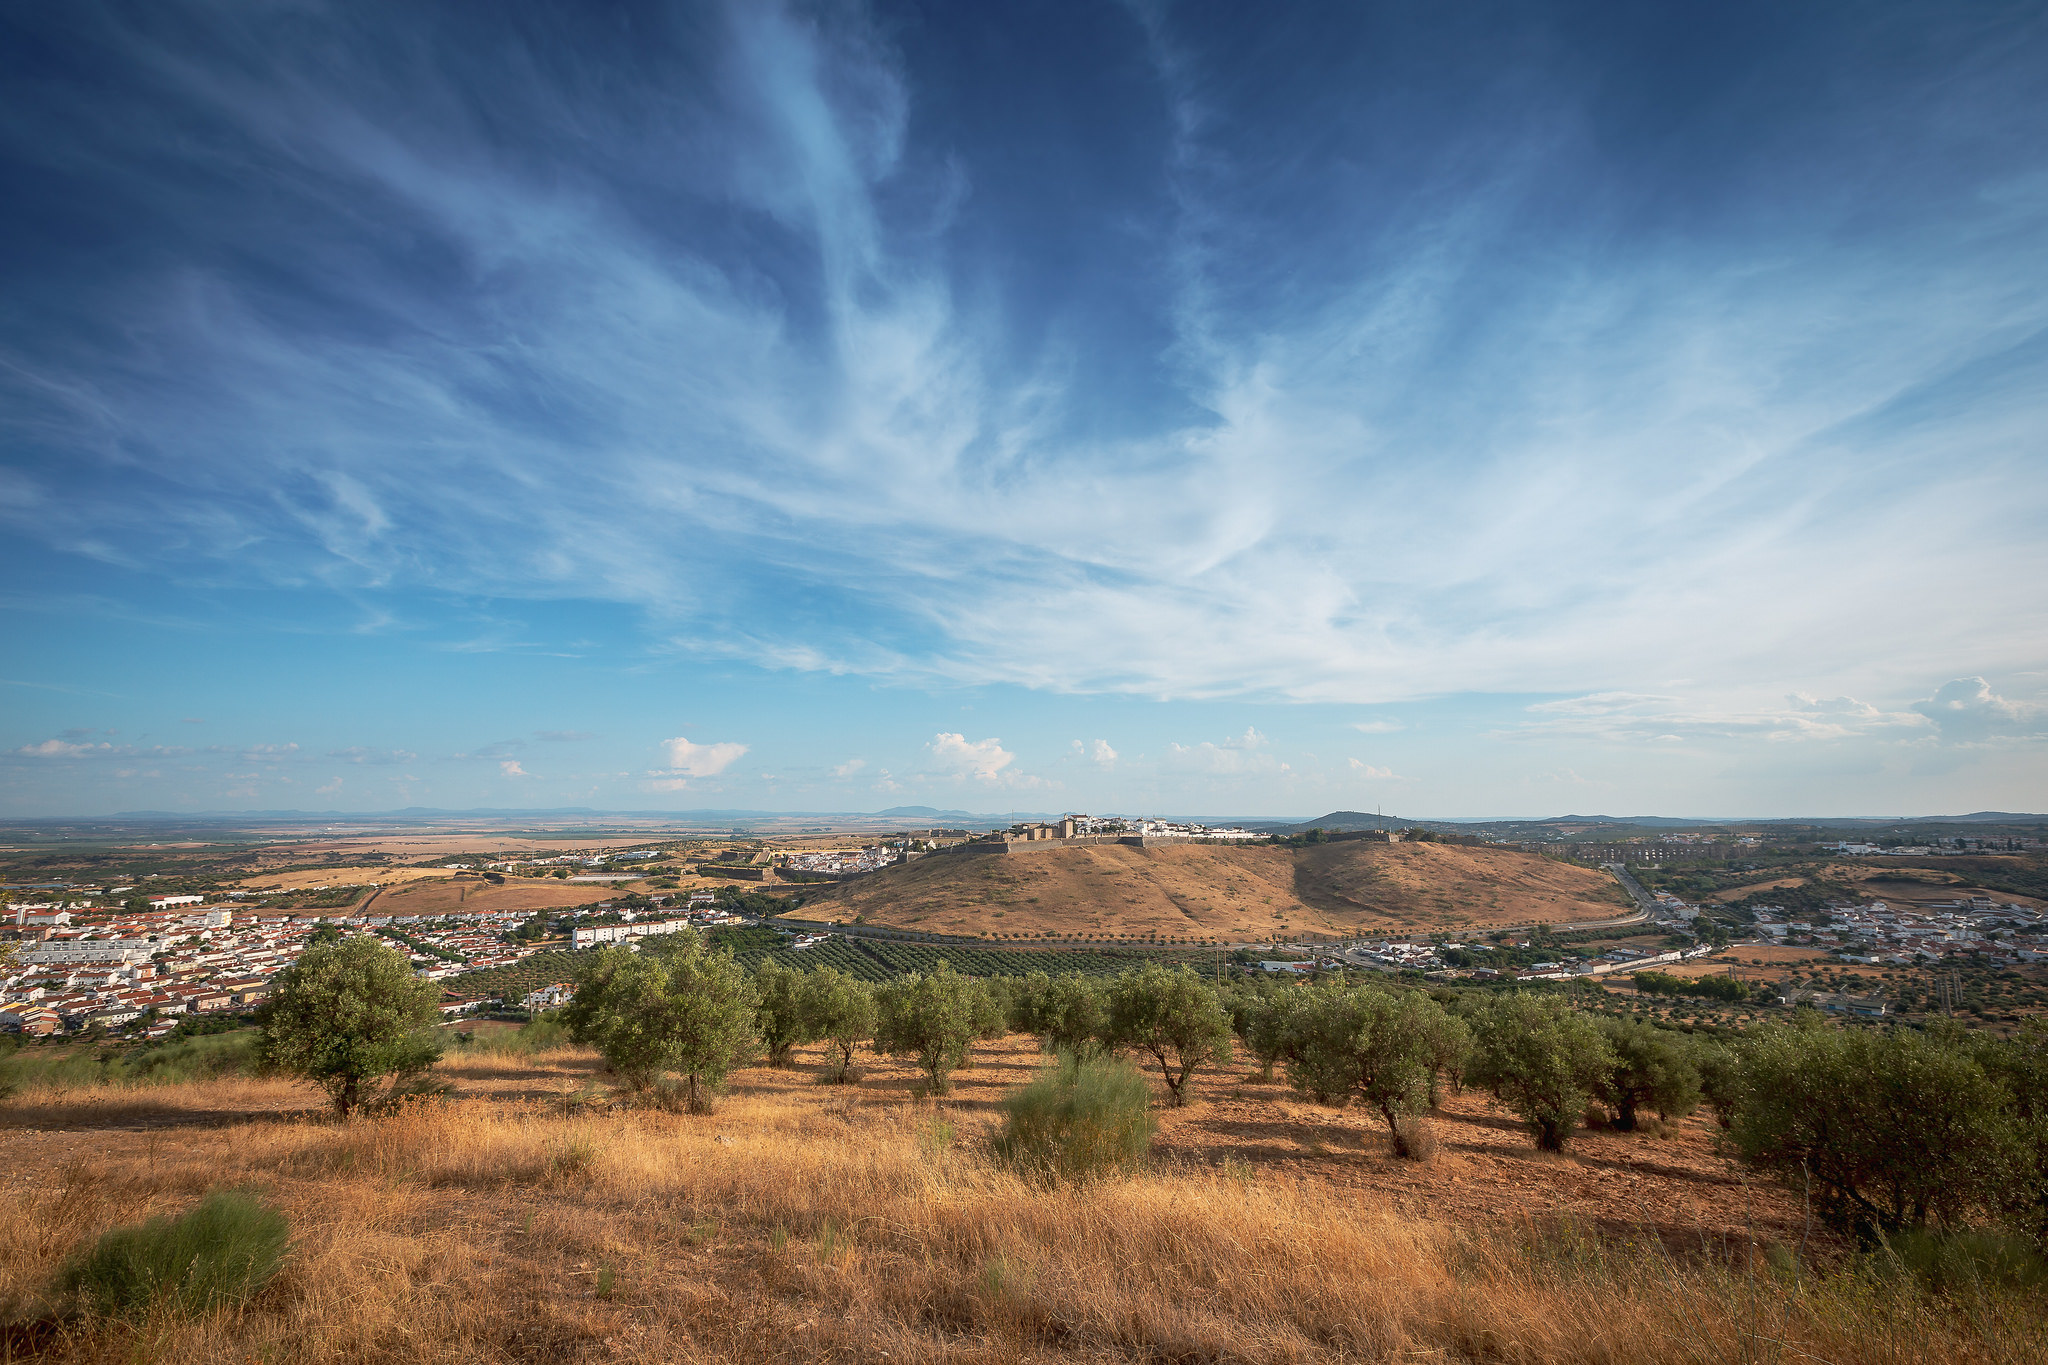 Portugal Loures property casafari metasearch real estate lisbon